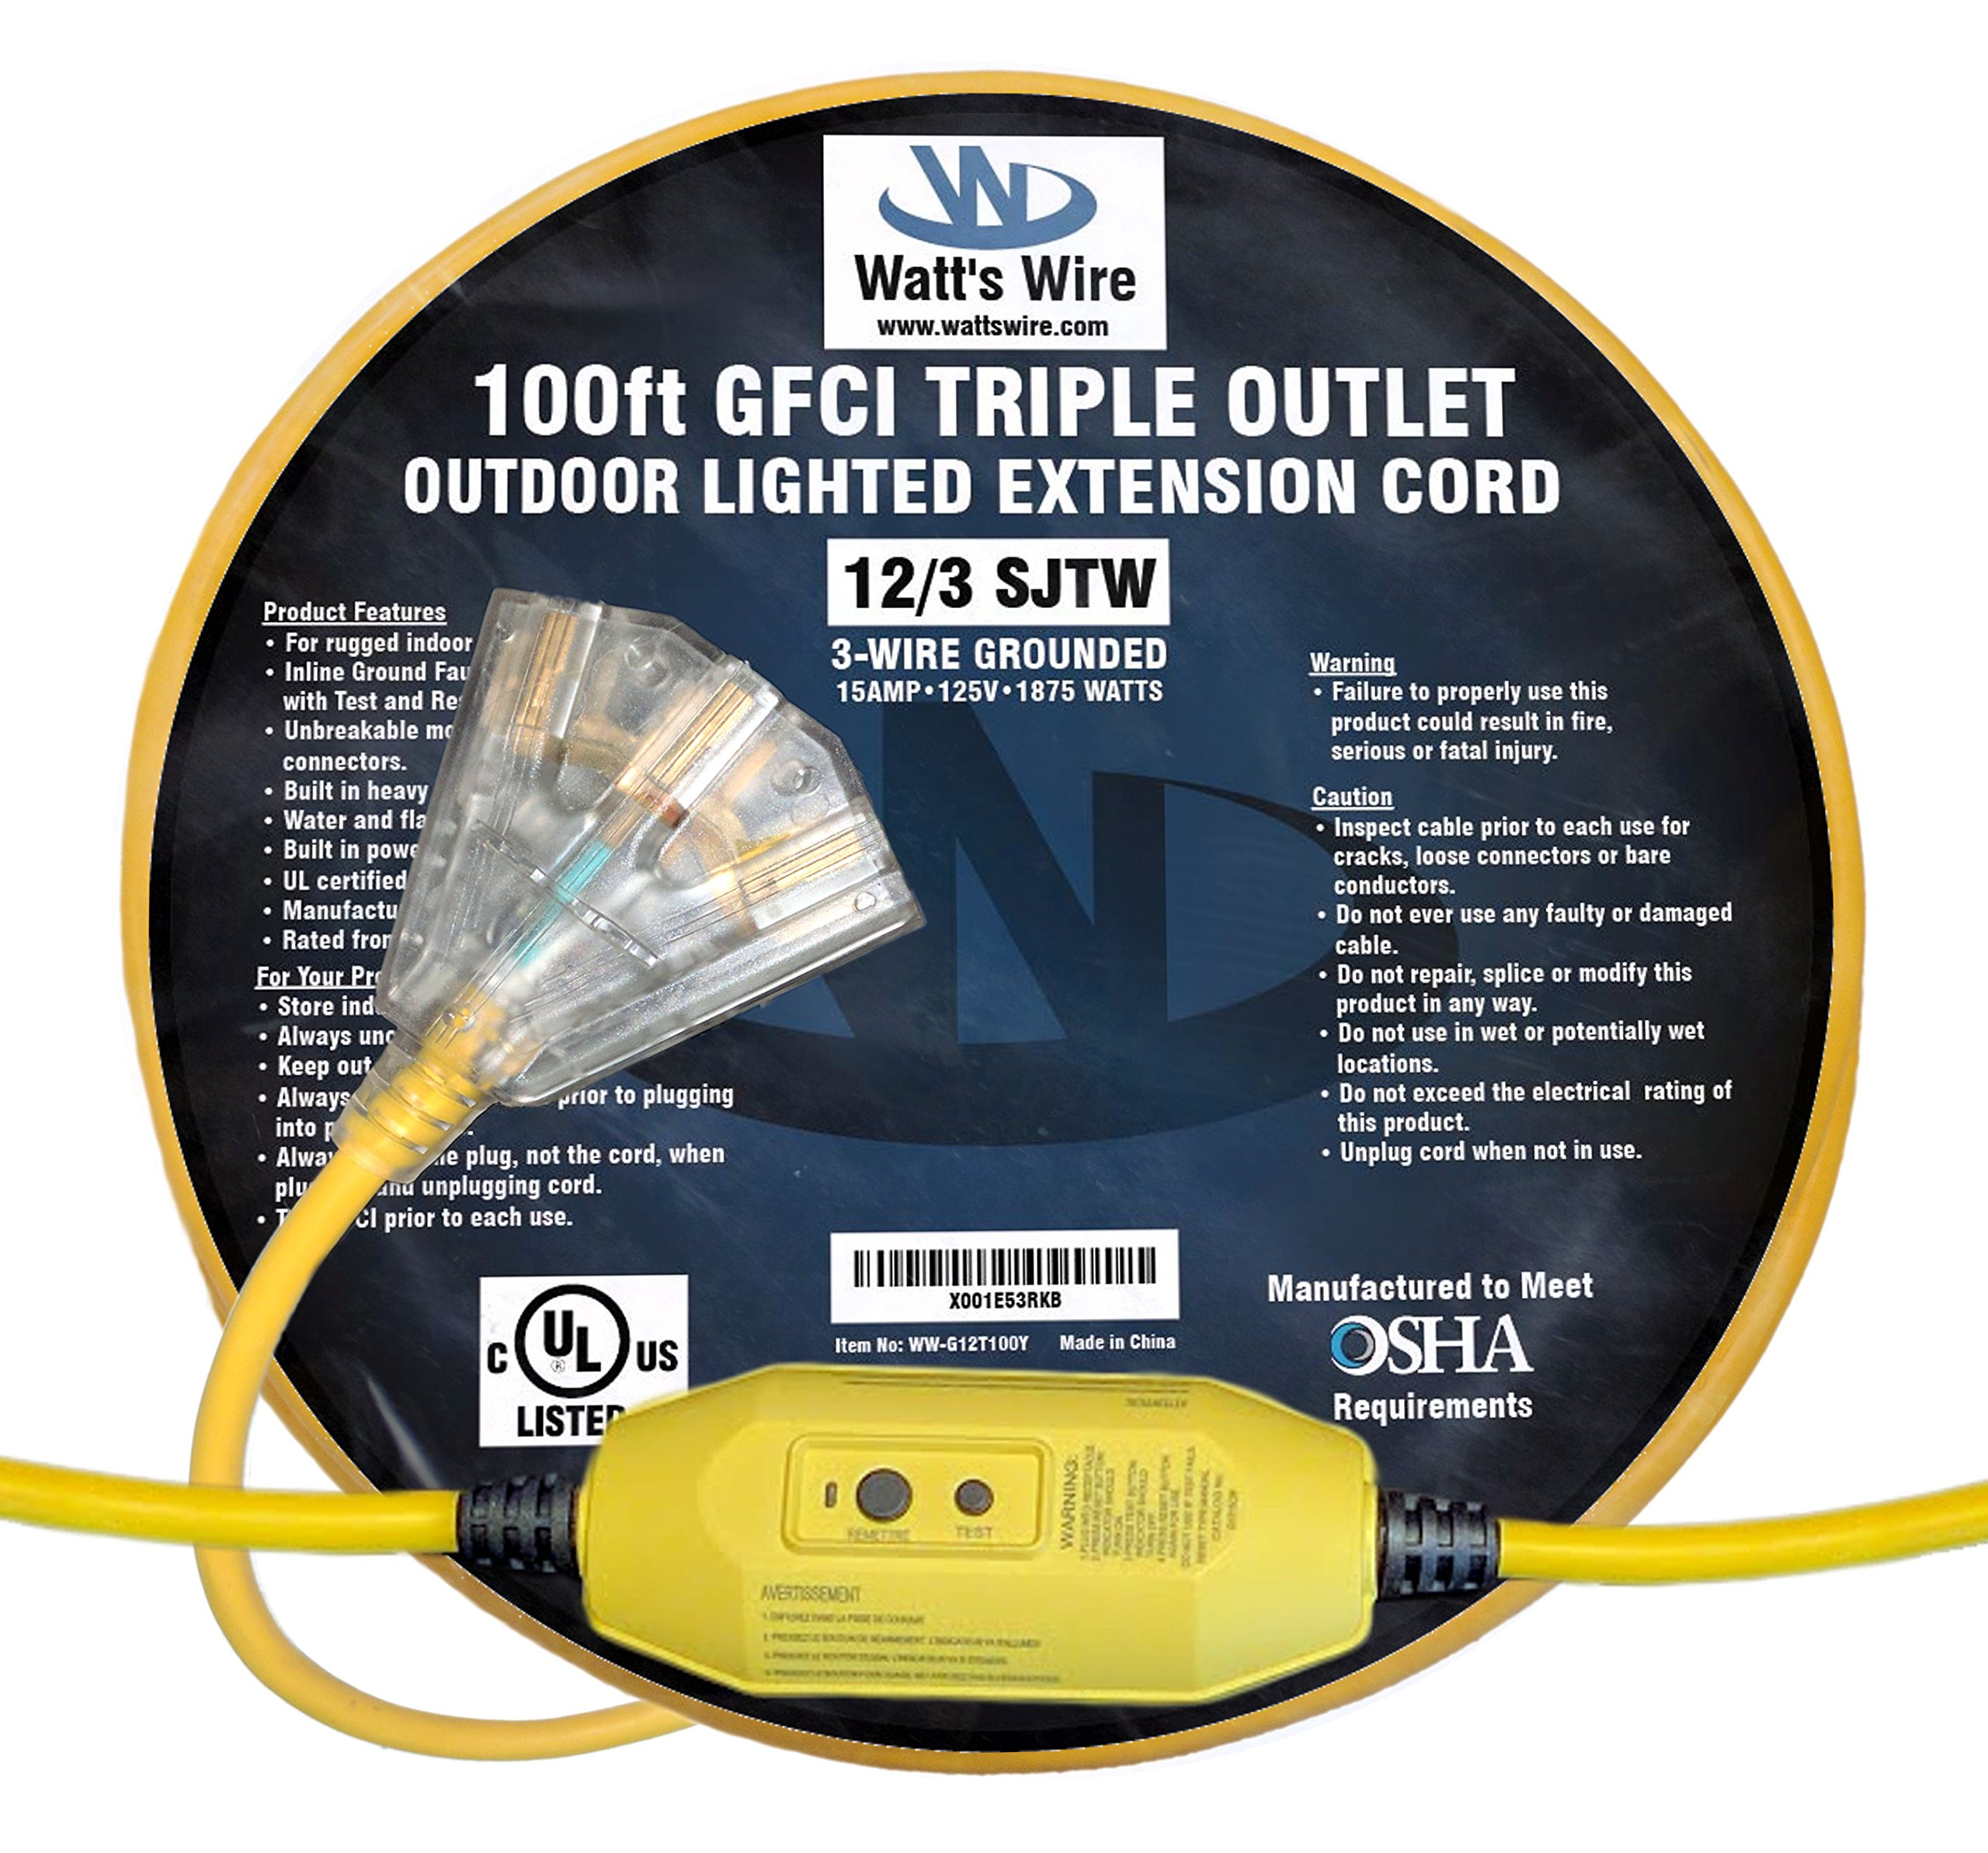 6.3mm Male Electrical Spade Crimp Terminals Wiring Connectors 100 Pcs Q7W8